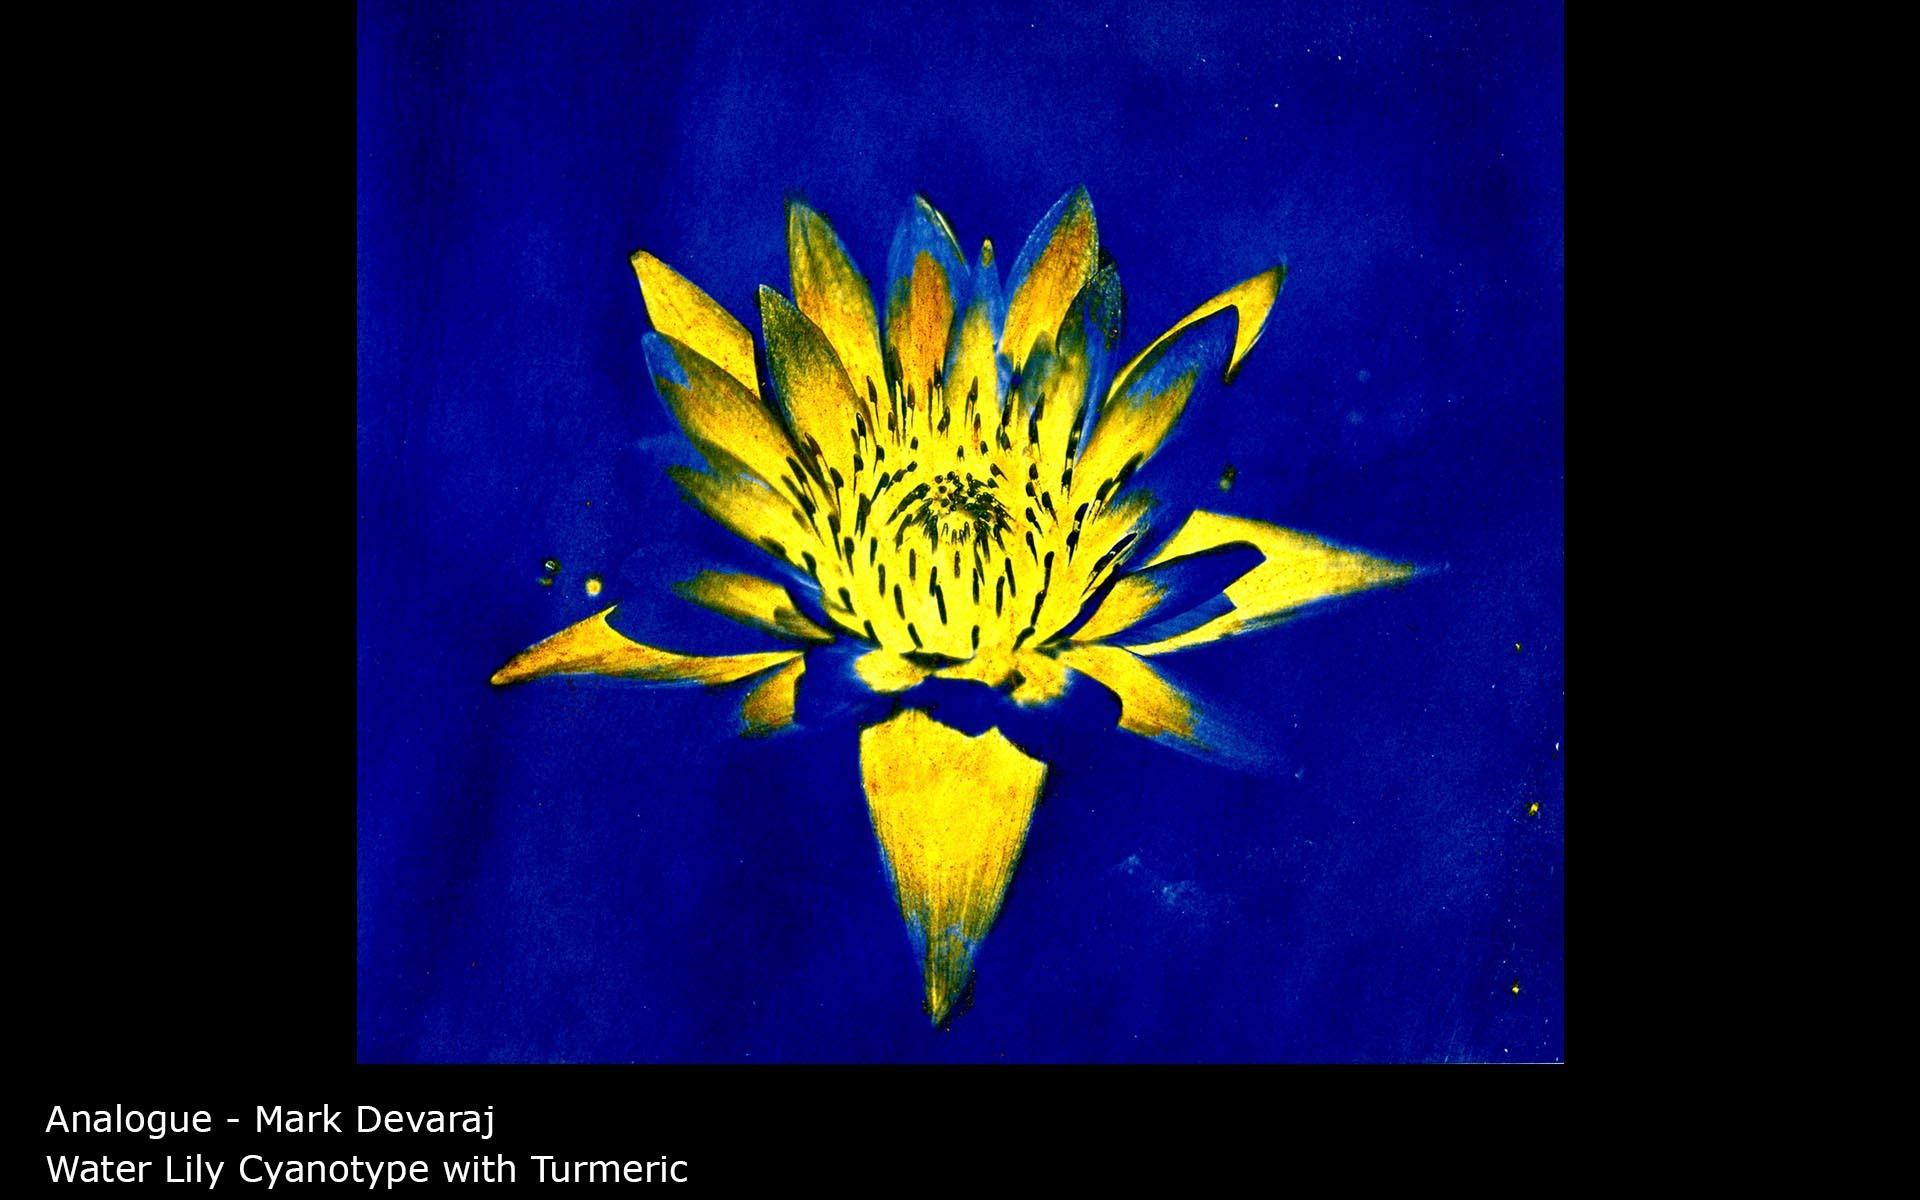 Water Lily Cyanotype with Turmeric - Mark Devaraj